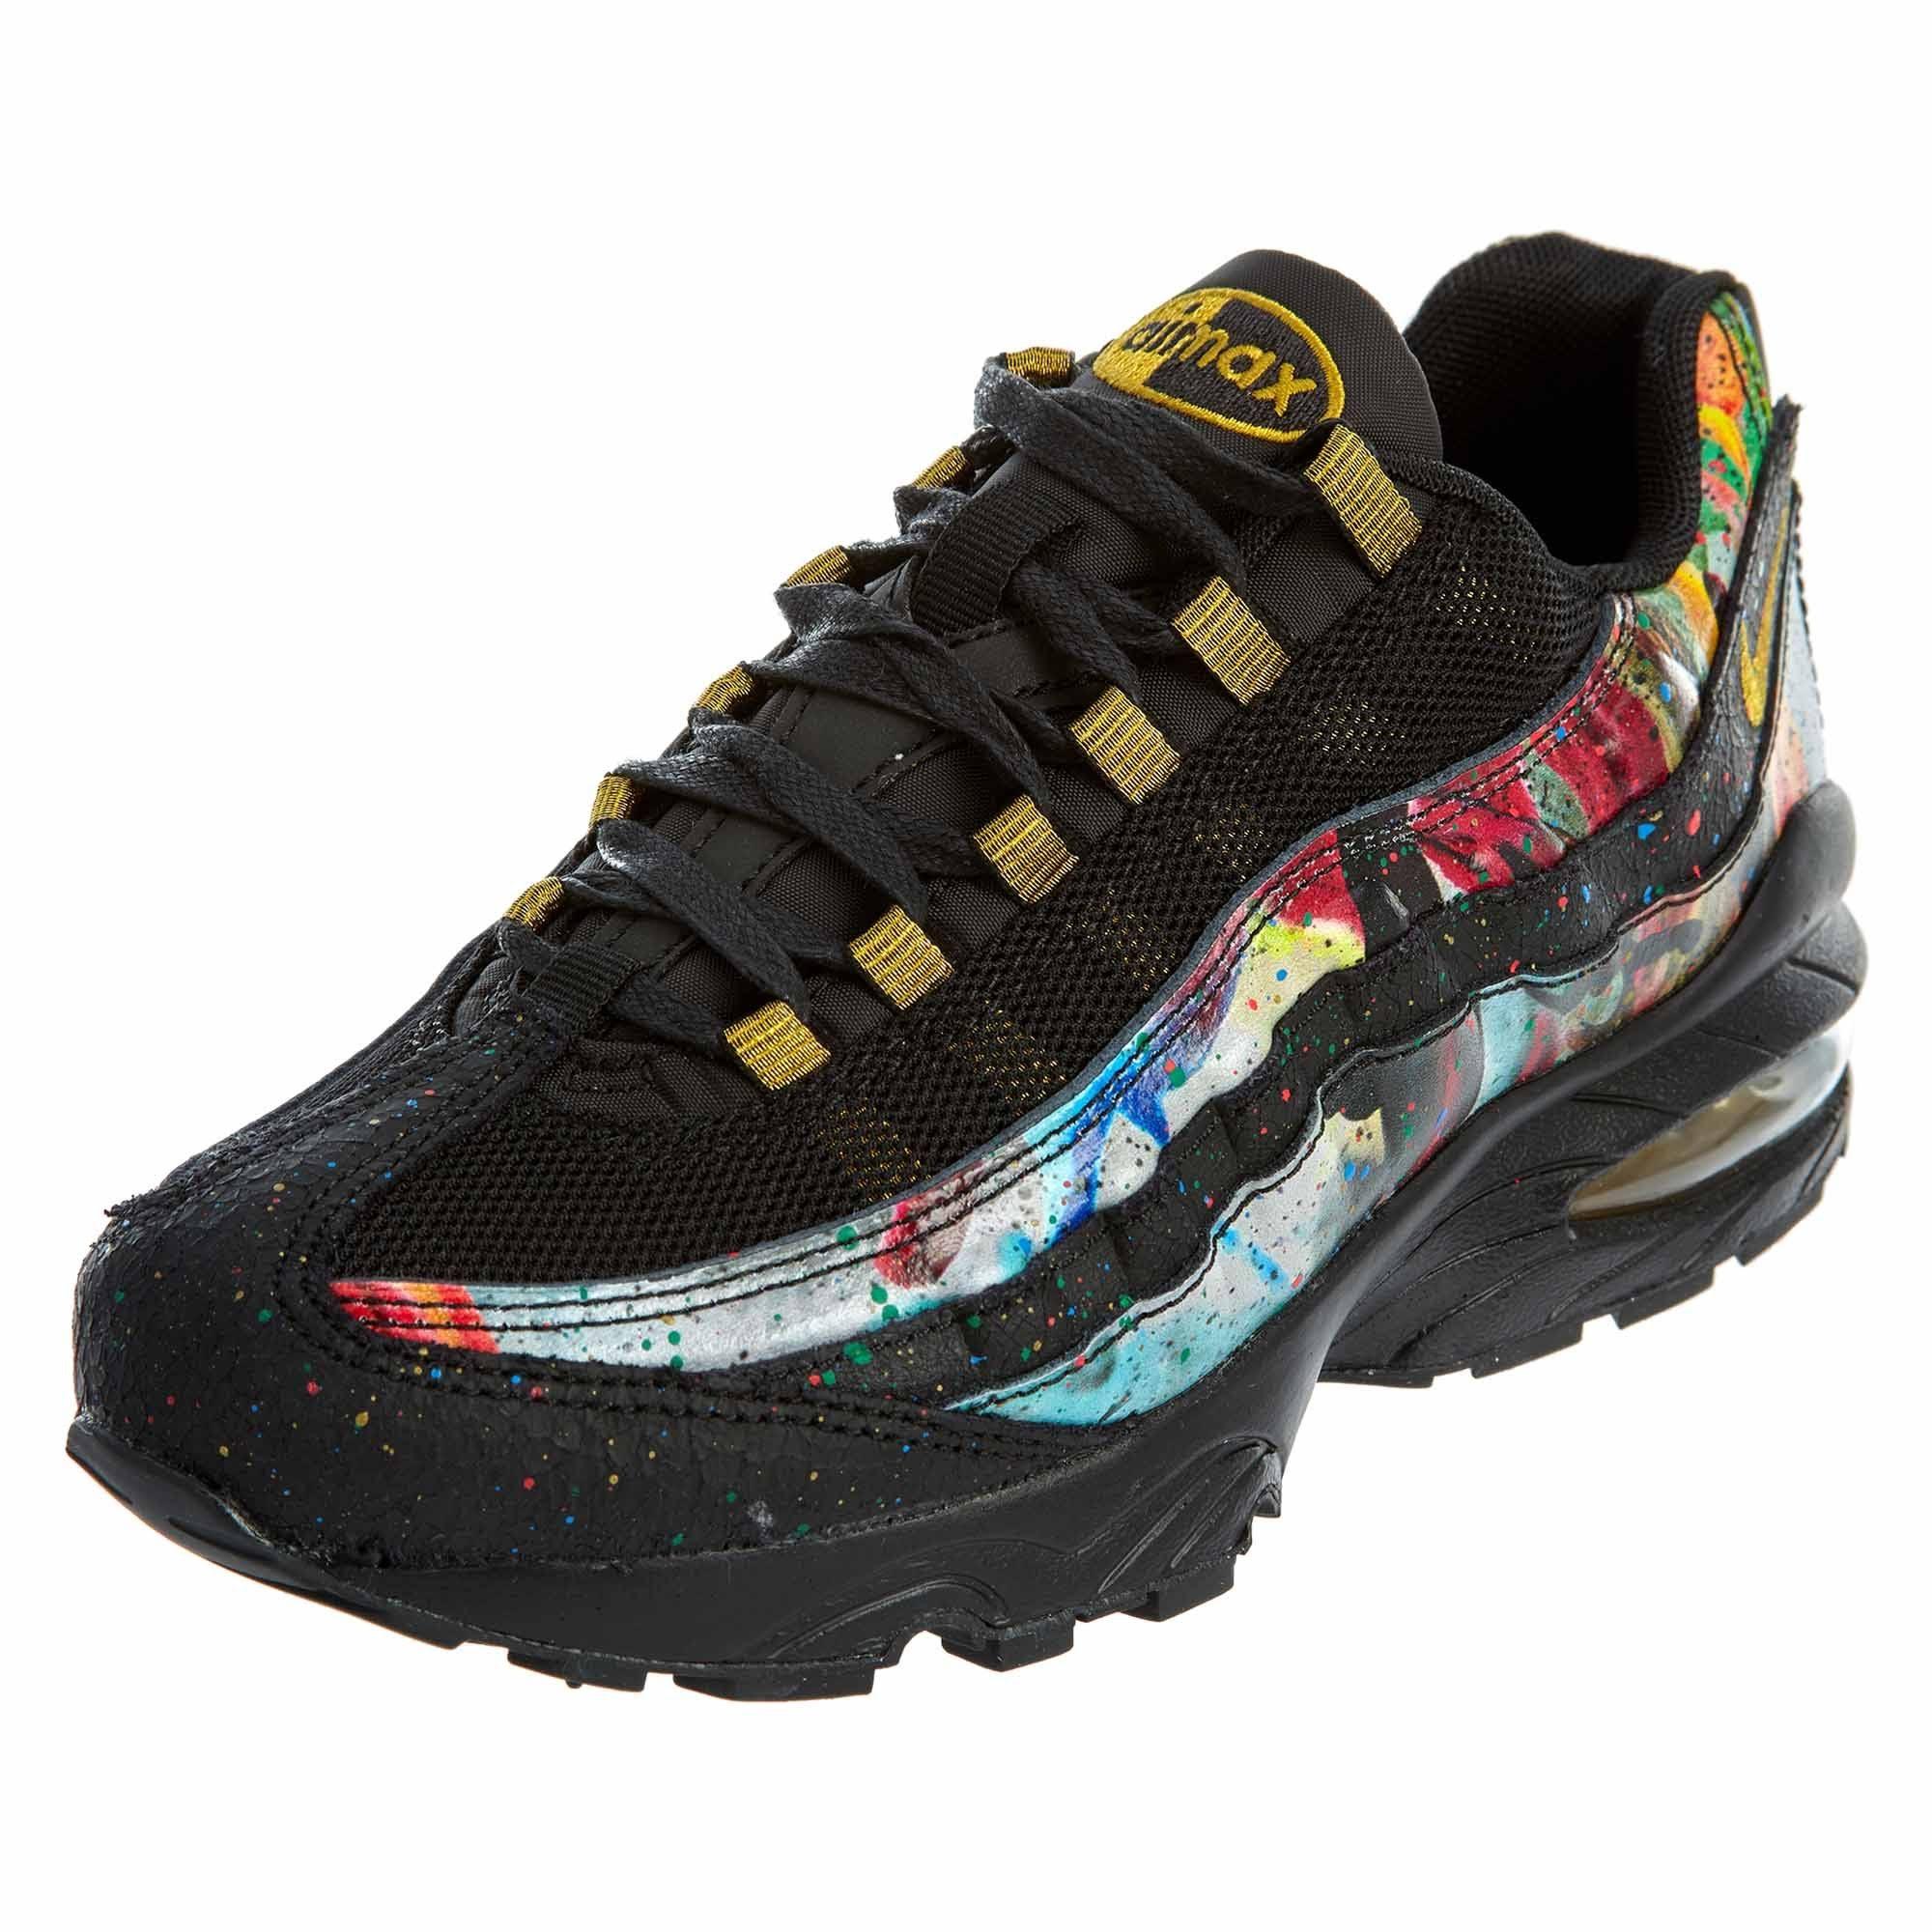 Big At6158 Cobalt Style 001 Black Gold Nike Kids 95 Blaze Max Met Air OqawqxYtg